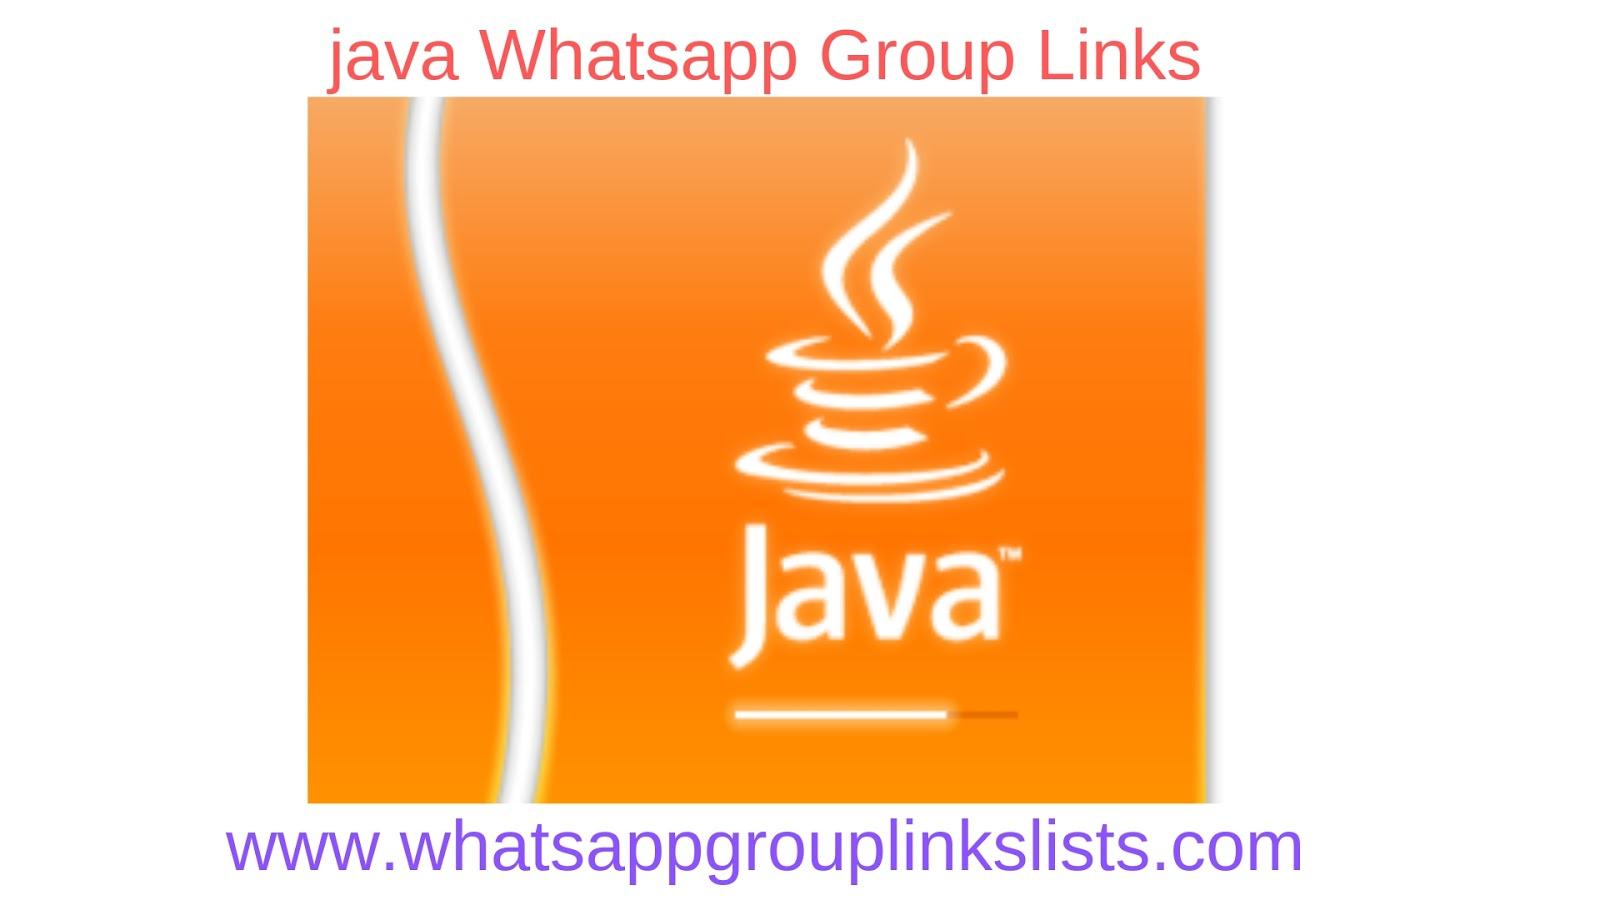 Join Java Whatsapp Group Links List